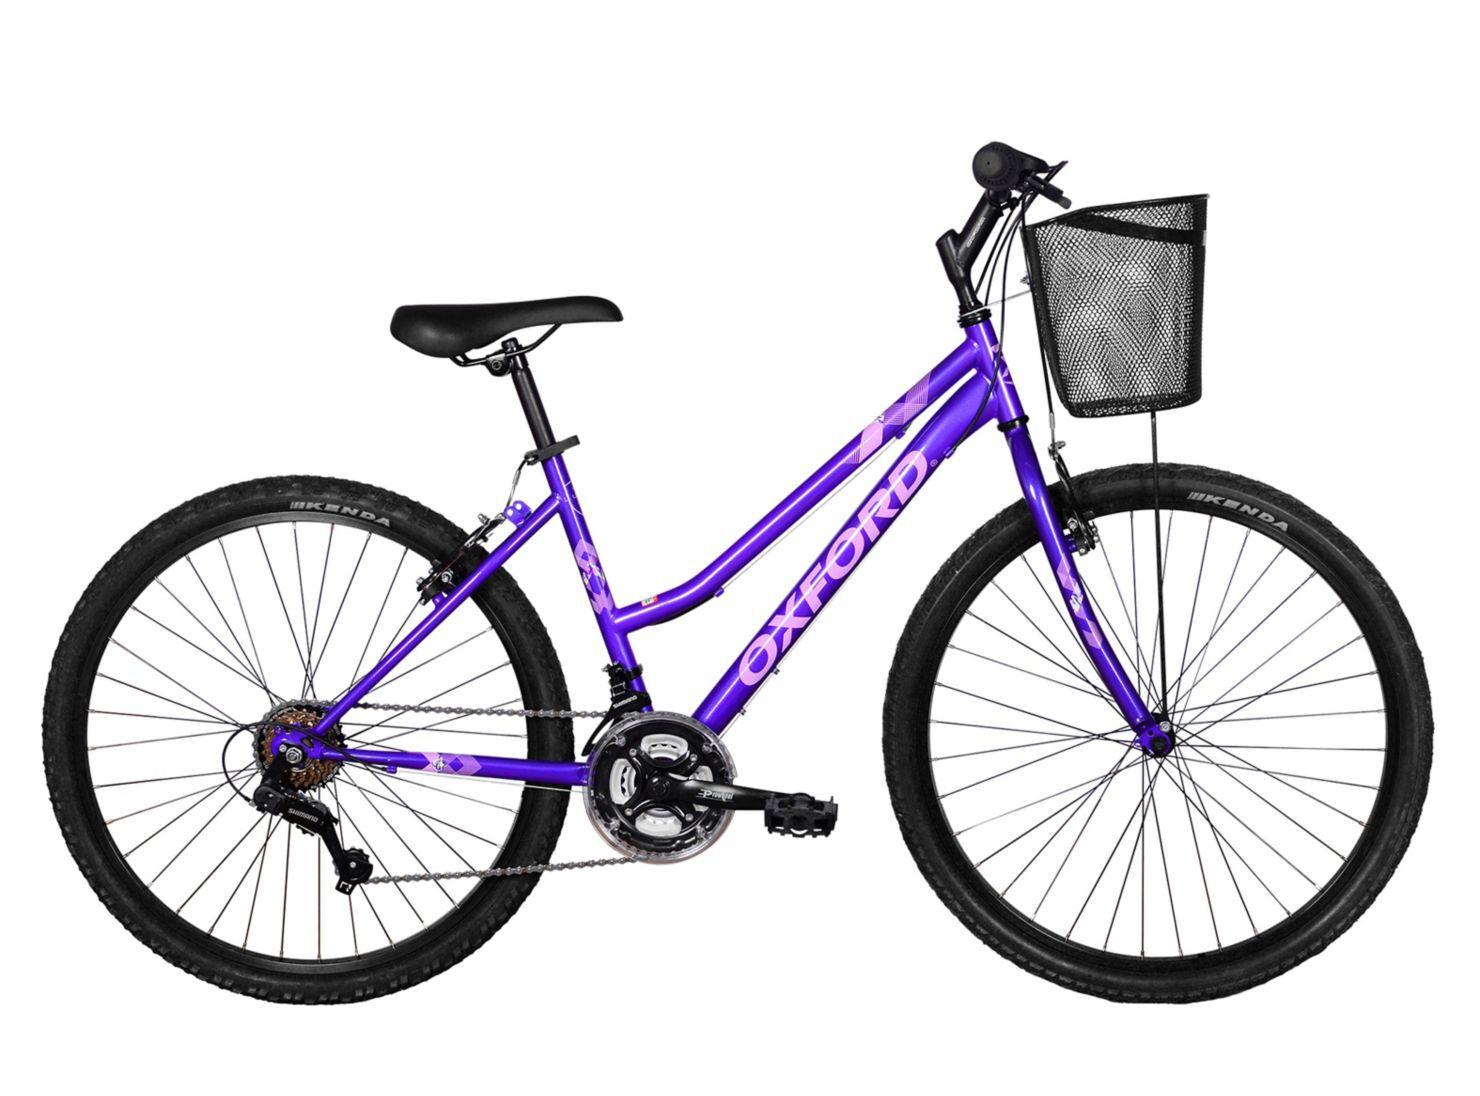 37d9a7f2e Bicicleta de Paseo Oxford Luna V Aro 26